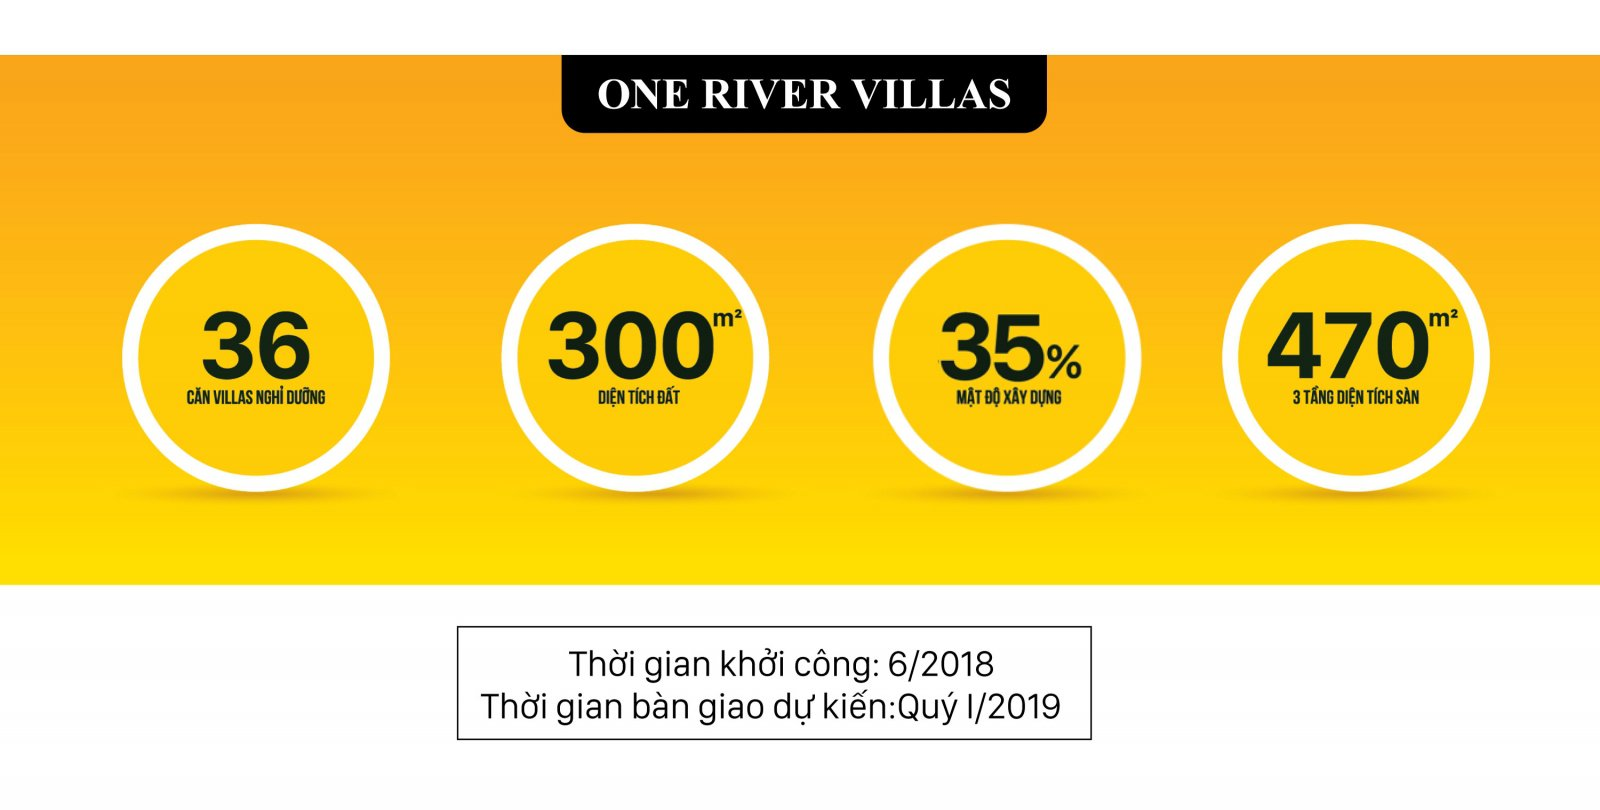 Tiến độ One river villas